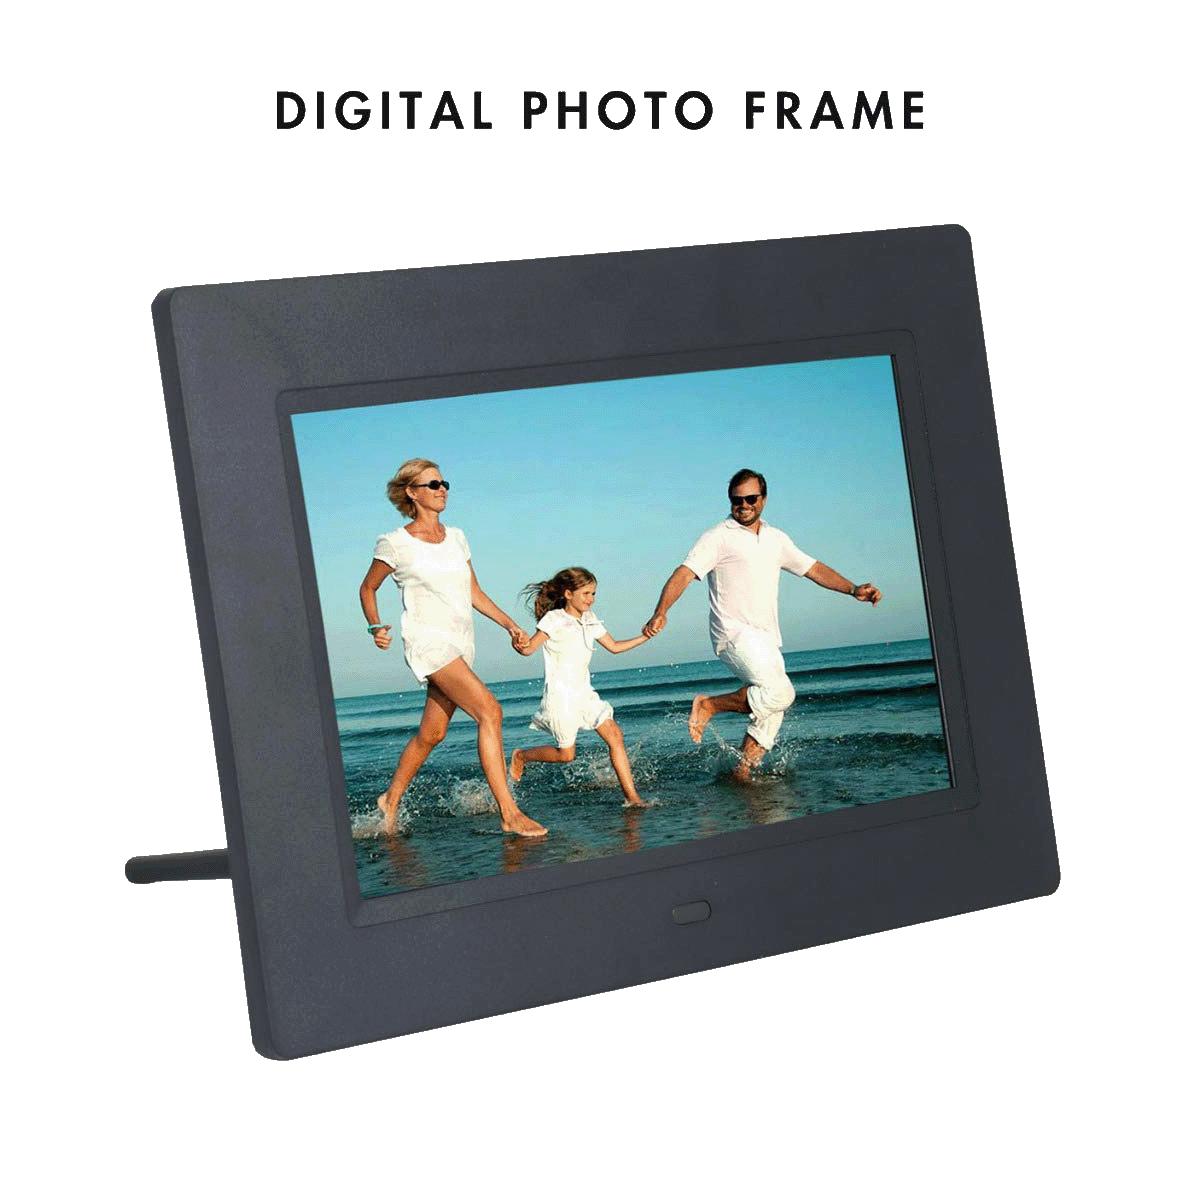 Xech 17.78 cm Digital Photo Frame (Black)_1